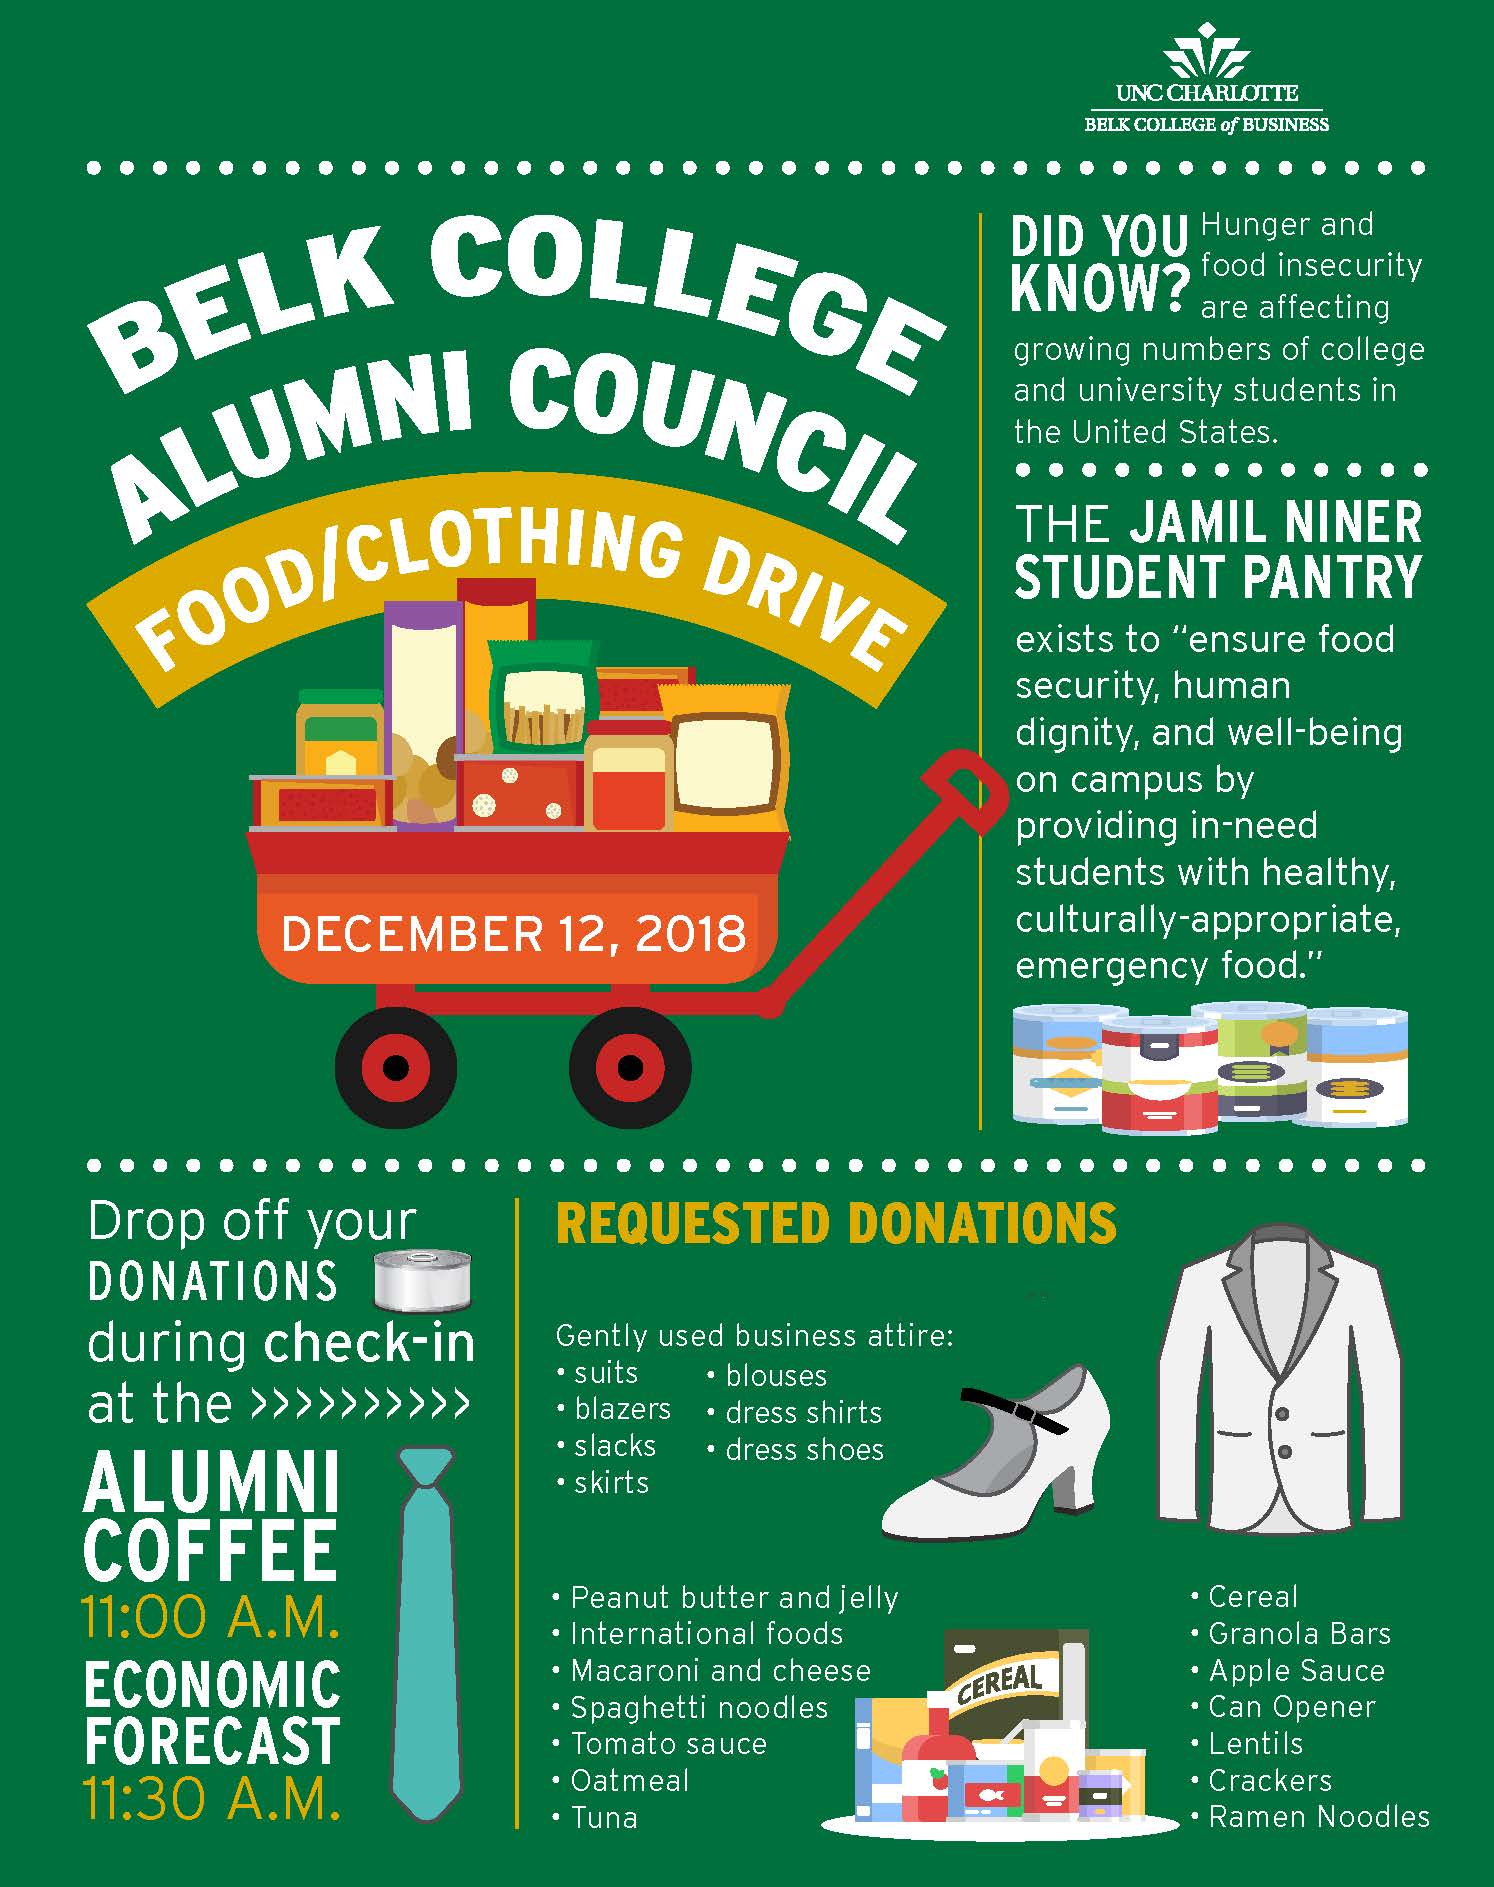 Alumni Council Food/Clothing Drive - Jamil Niner Student